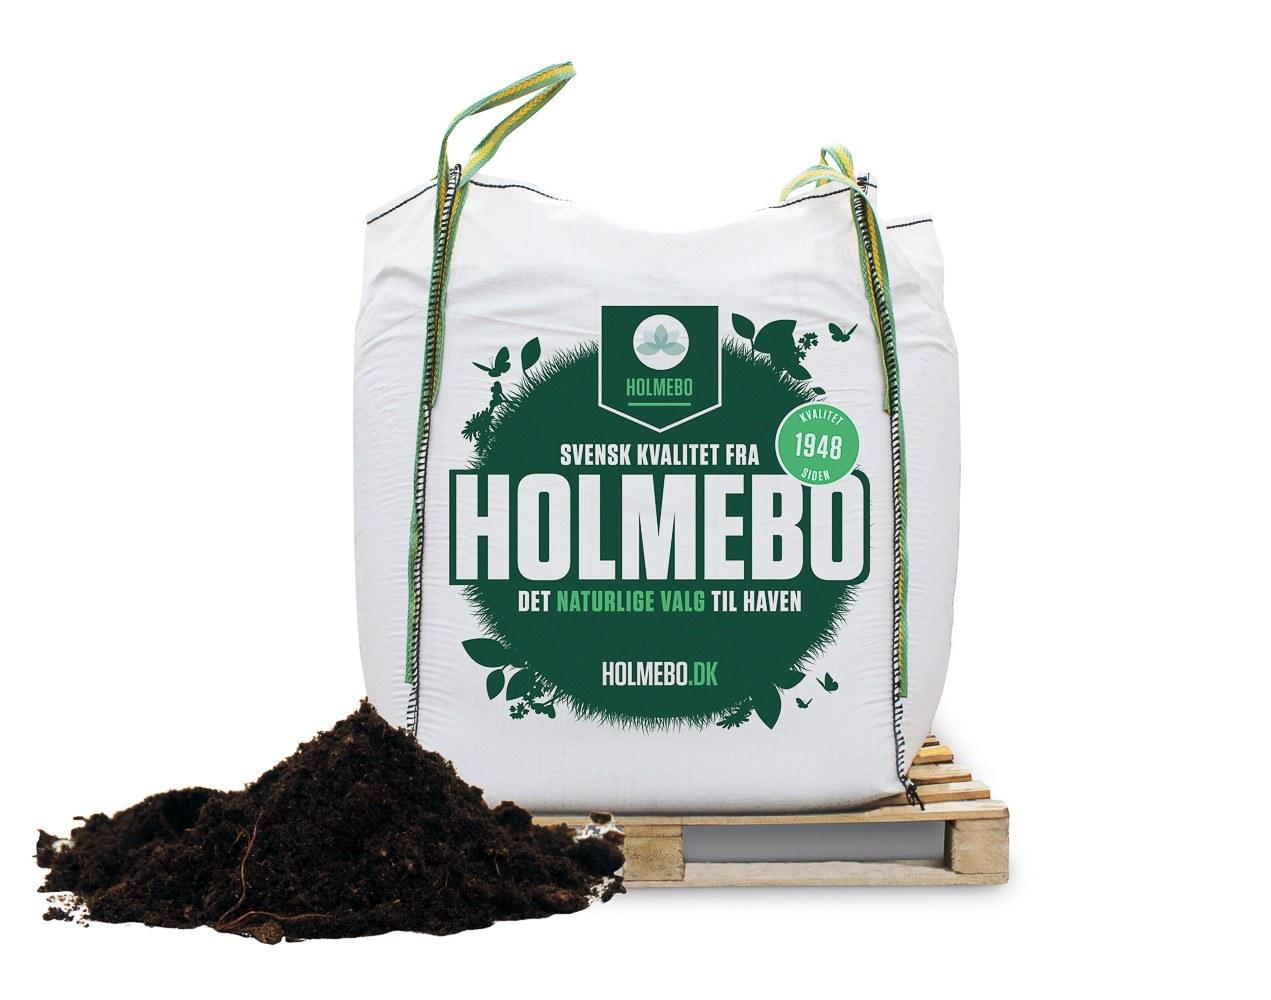 Holmebo All round jordforbedring - Bigbag á 1000 liter